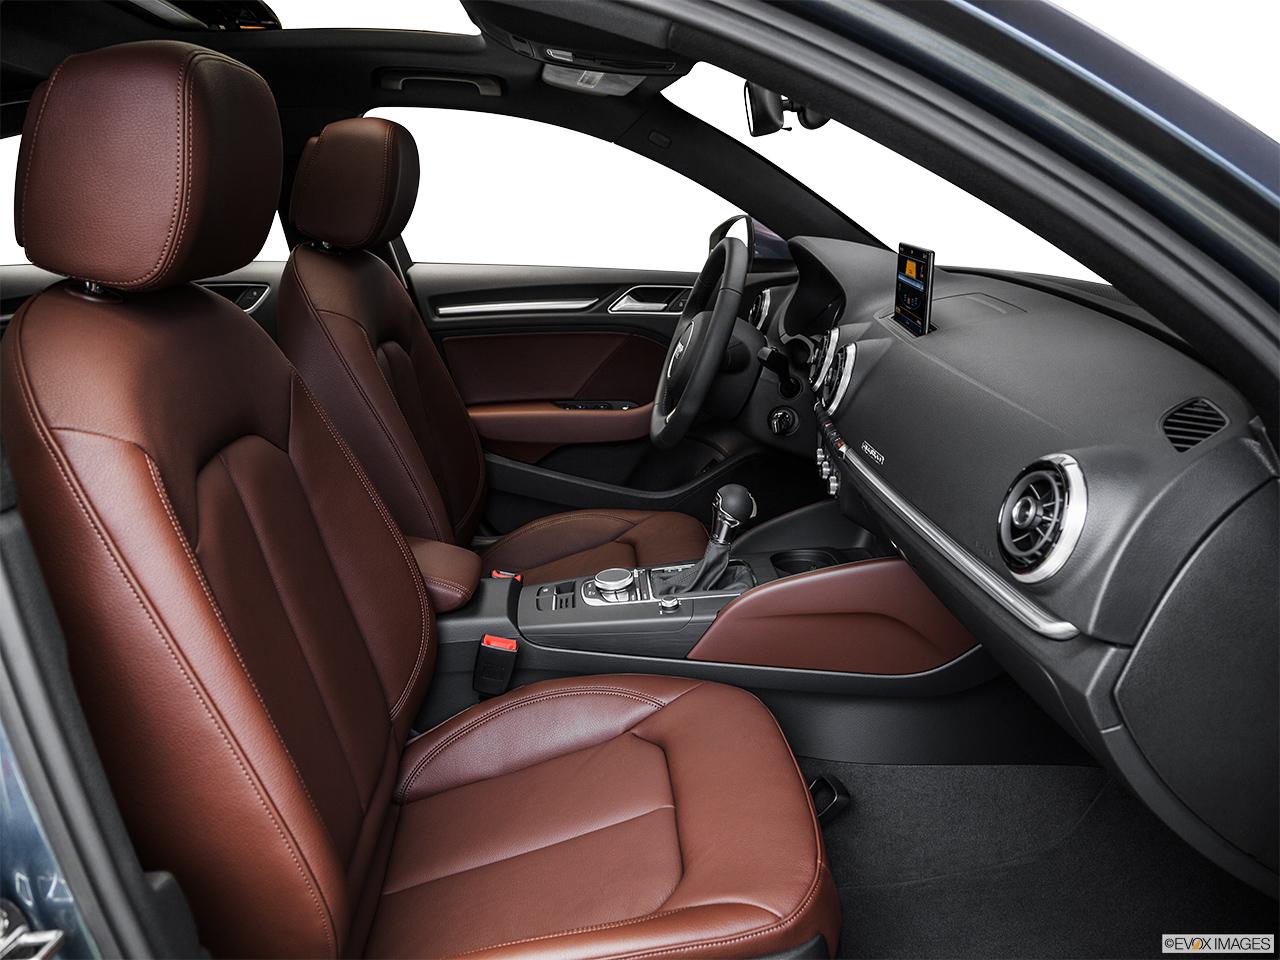 2015 Audi A3 Sedan Fwd 1 8t Prestige Passenger Seat